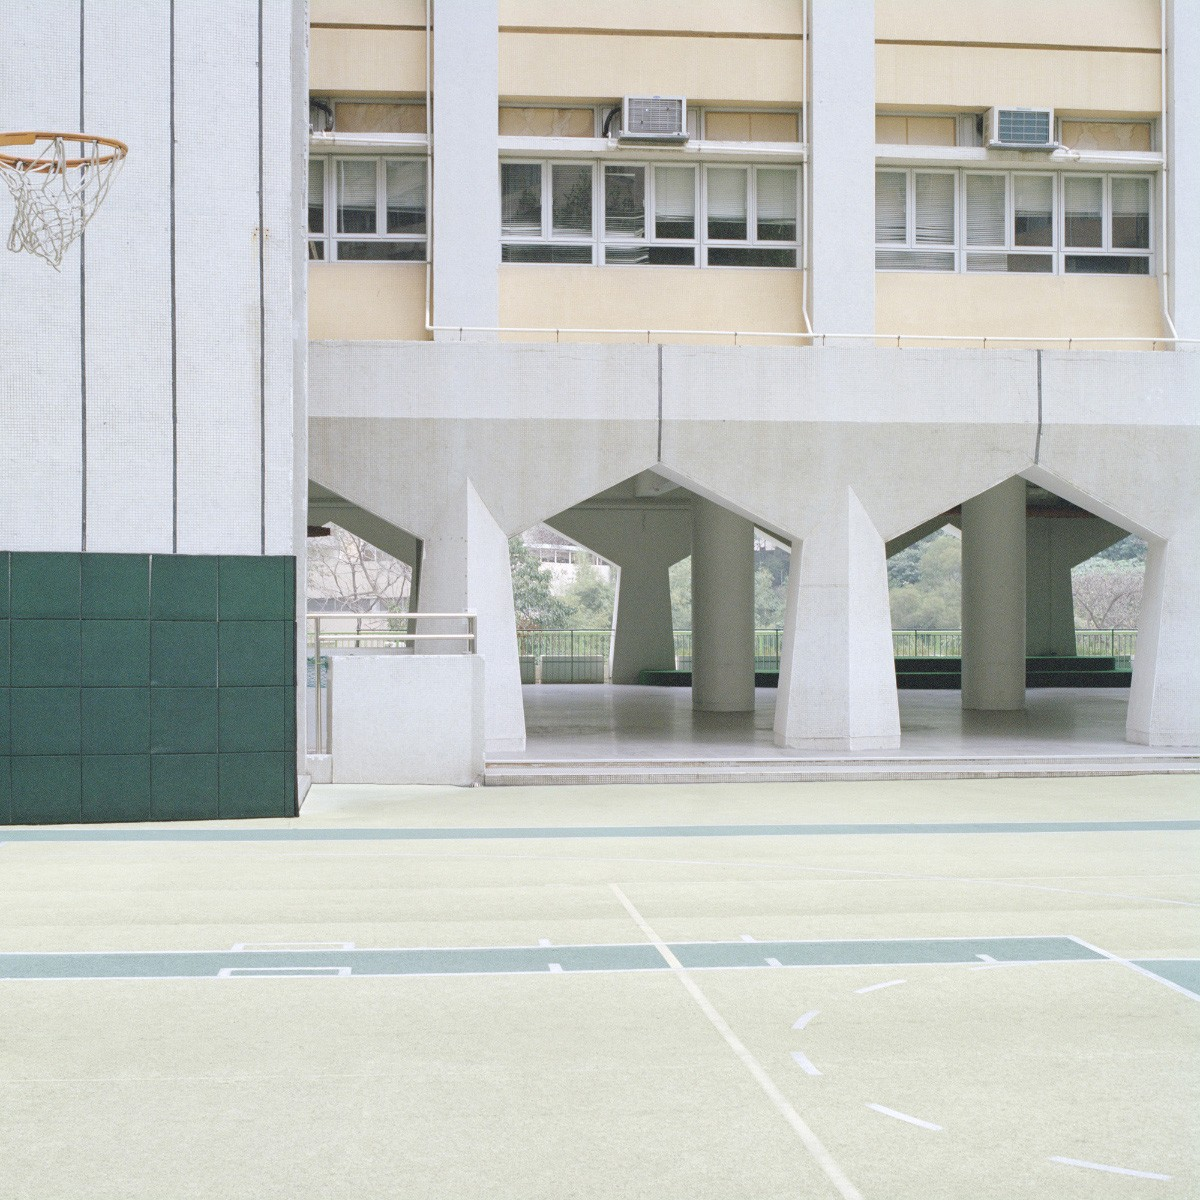 ward-roberts-courts-02.2-052aad009dfe42975f2394f64a1aec55